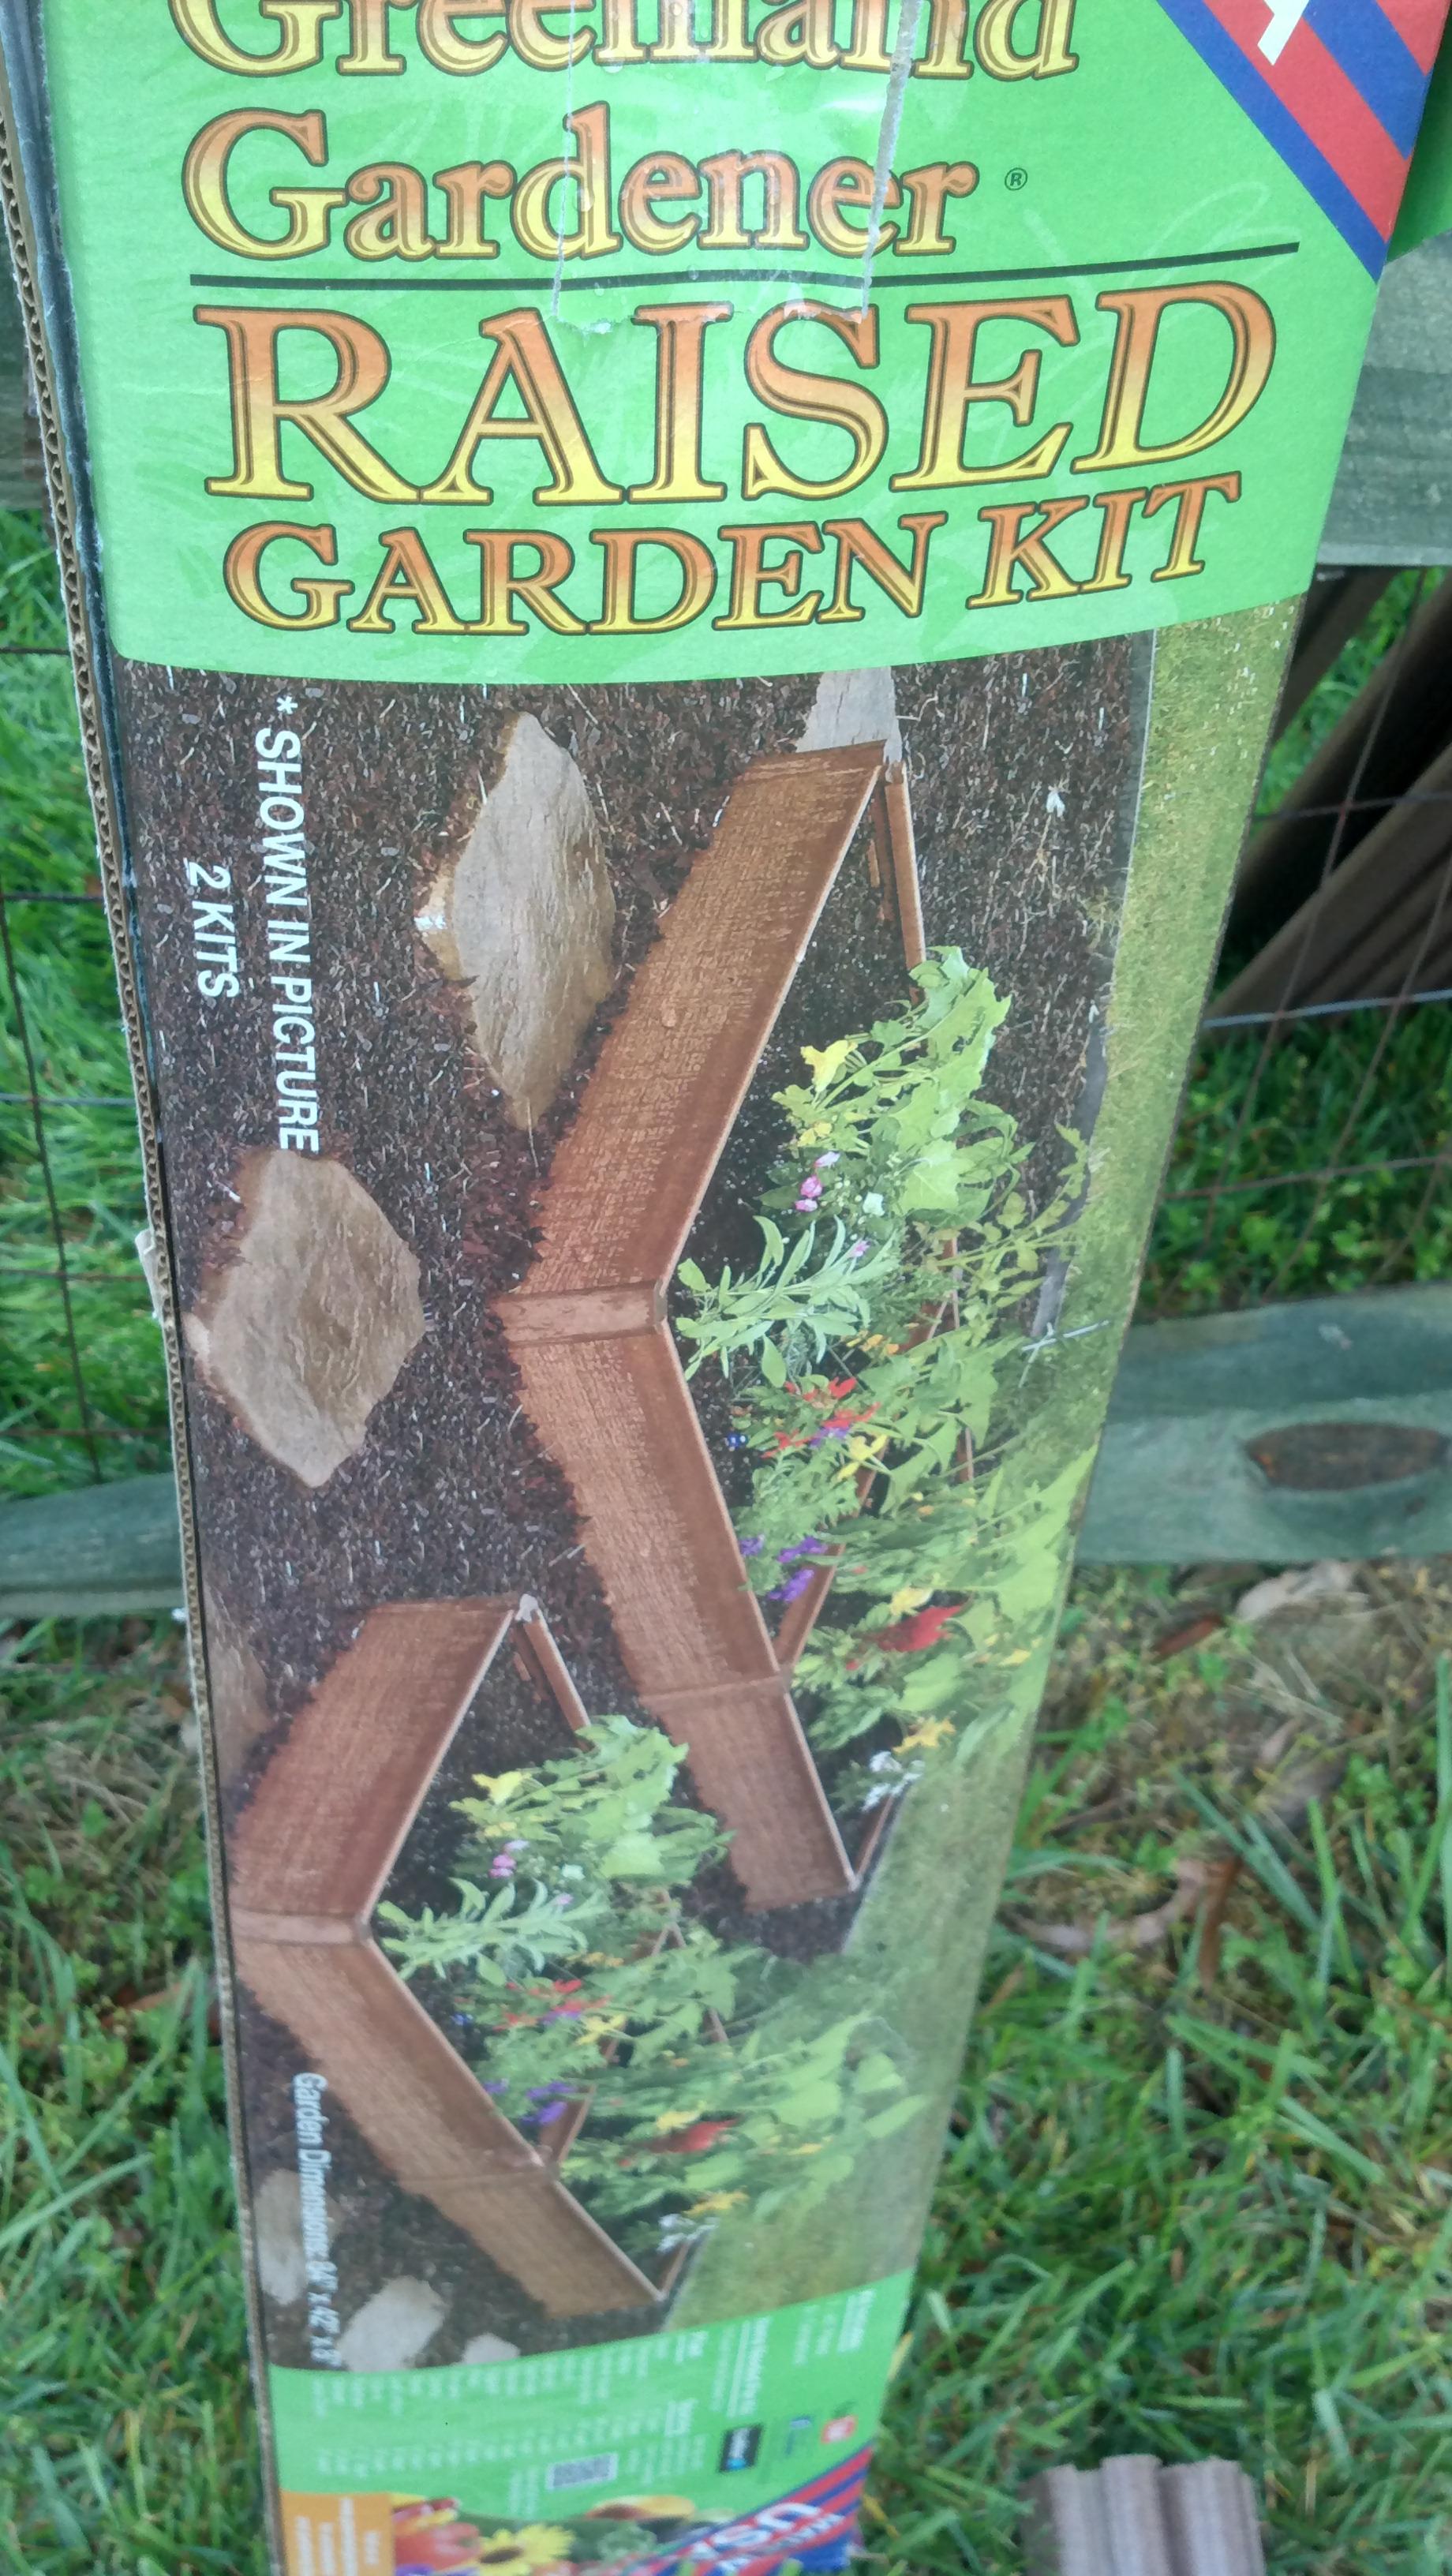 Greenland gardener raised bed garden kit - Greenland Gardener Squarefoot Raised Bed Garden